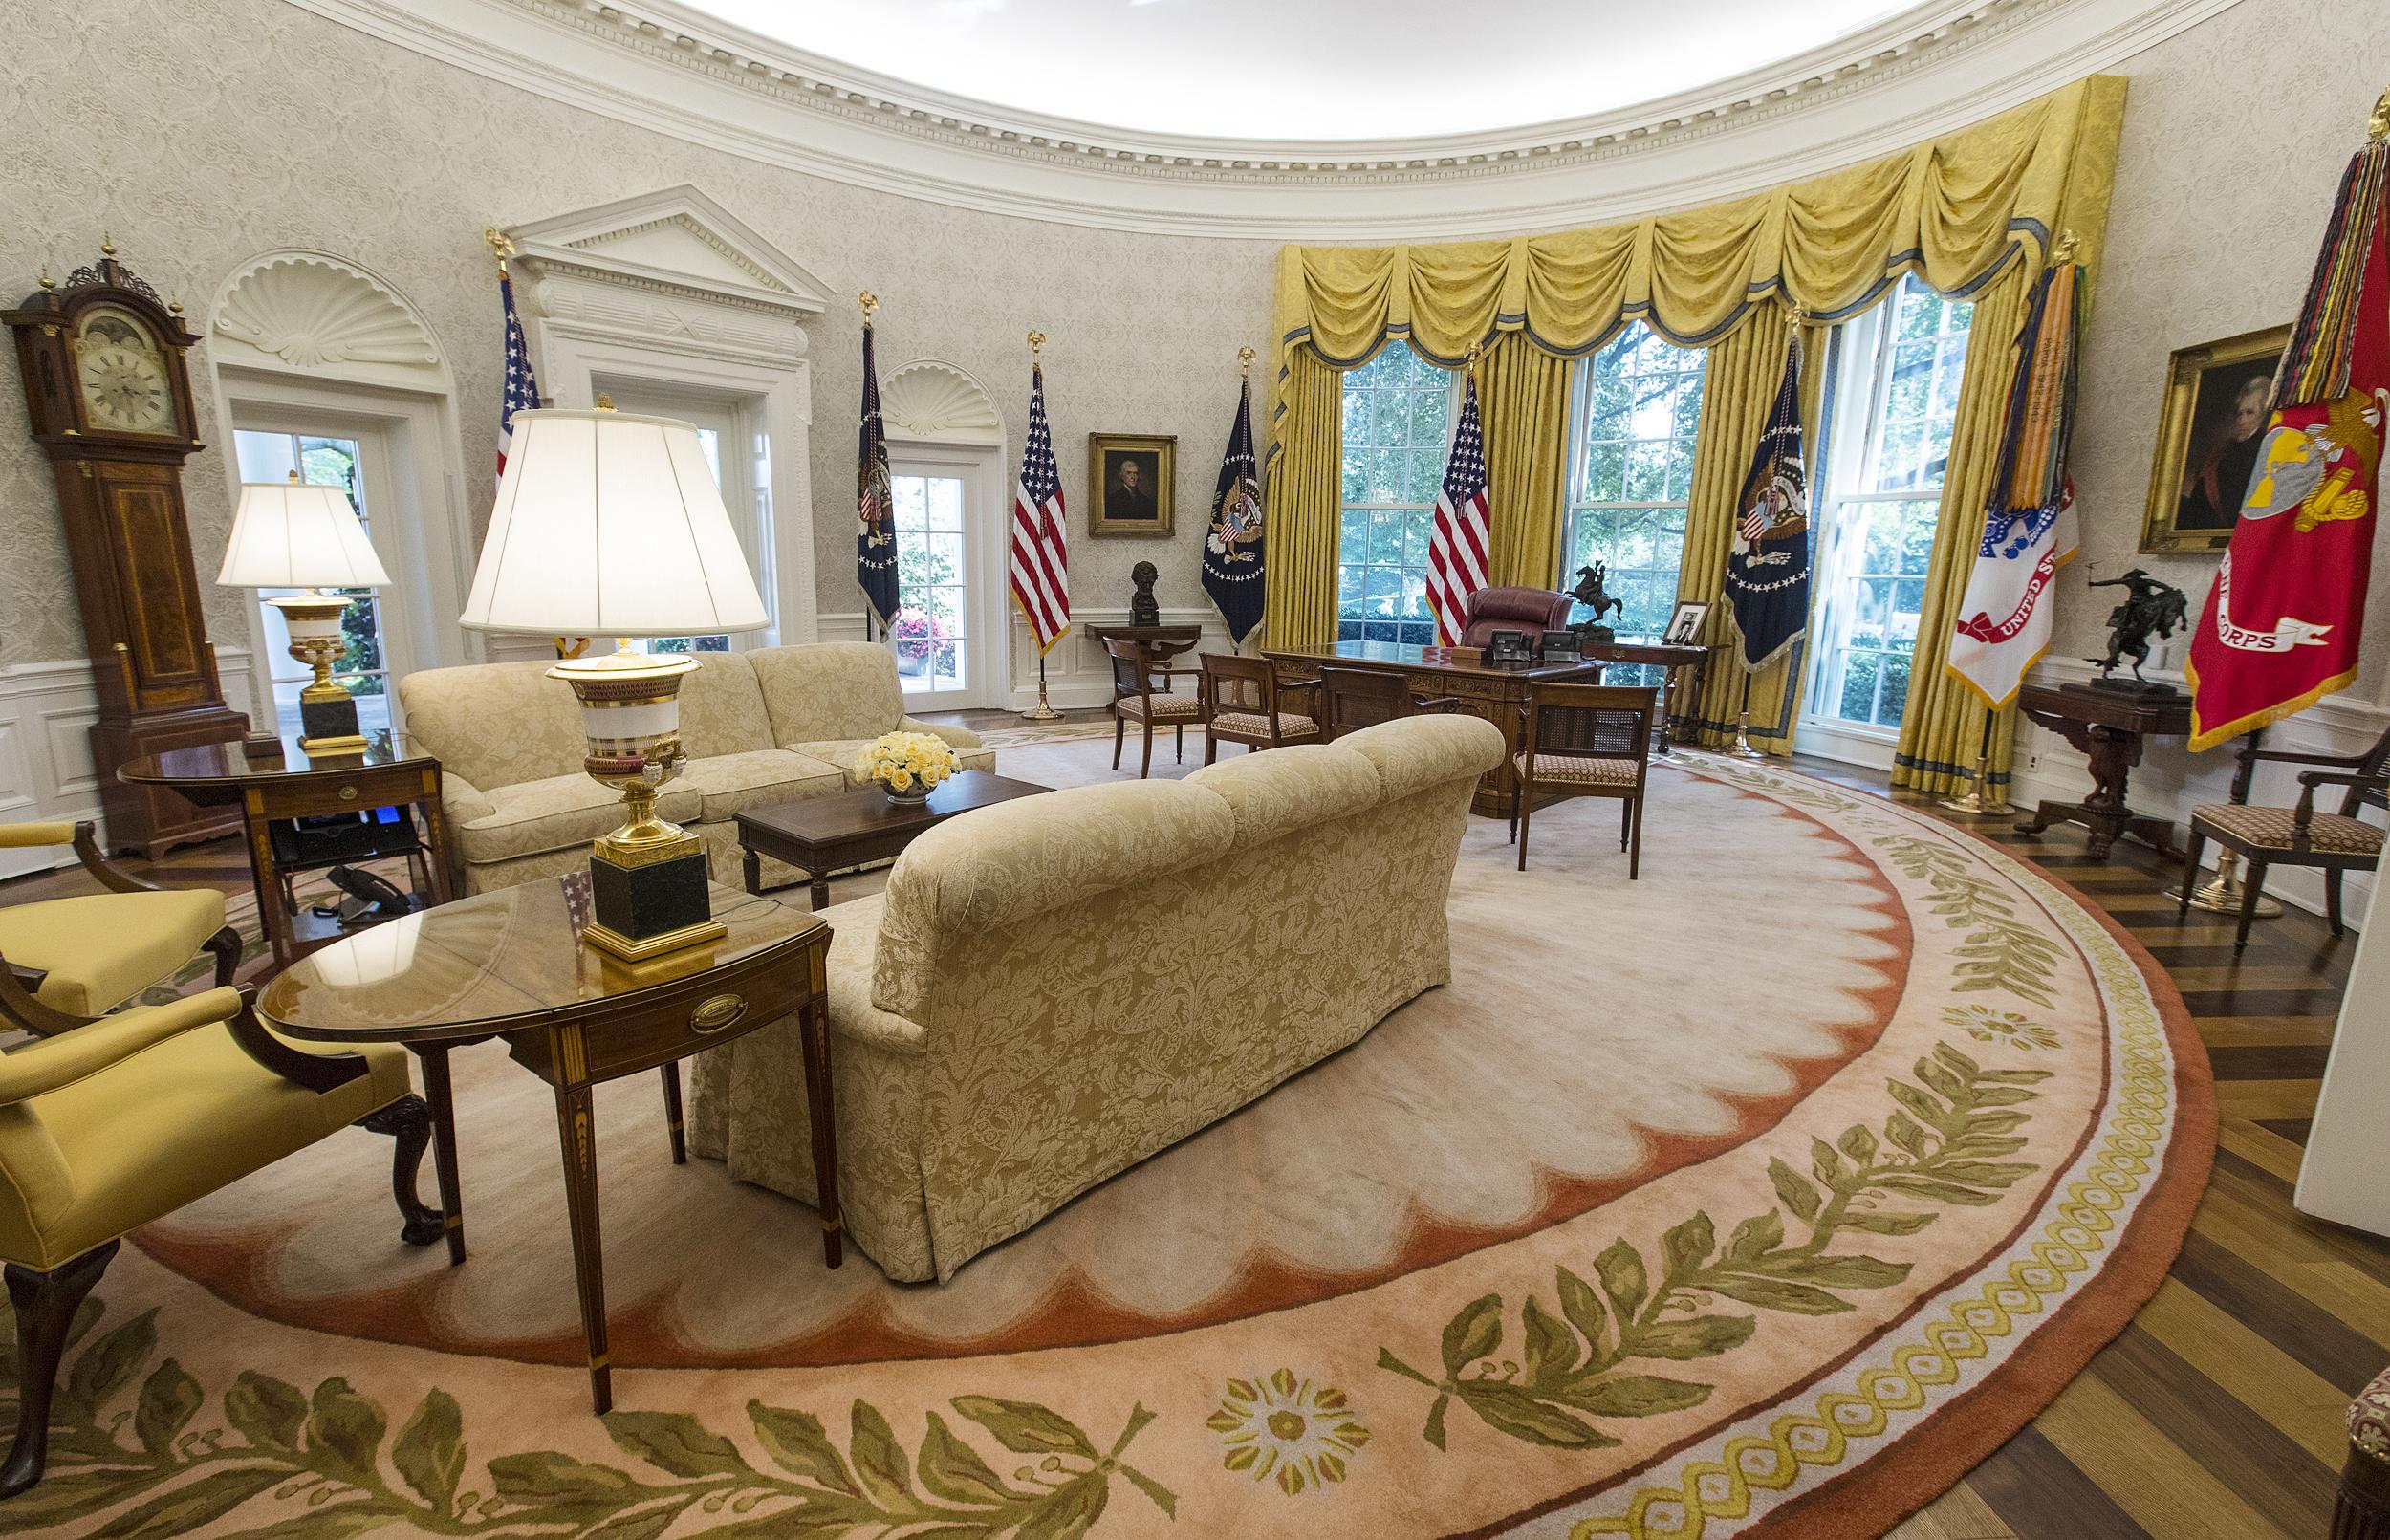 Trump spending $1.75 million on presidential furniture redecorations